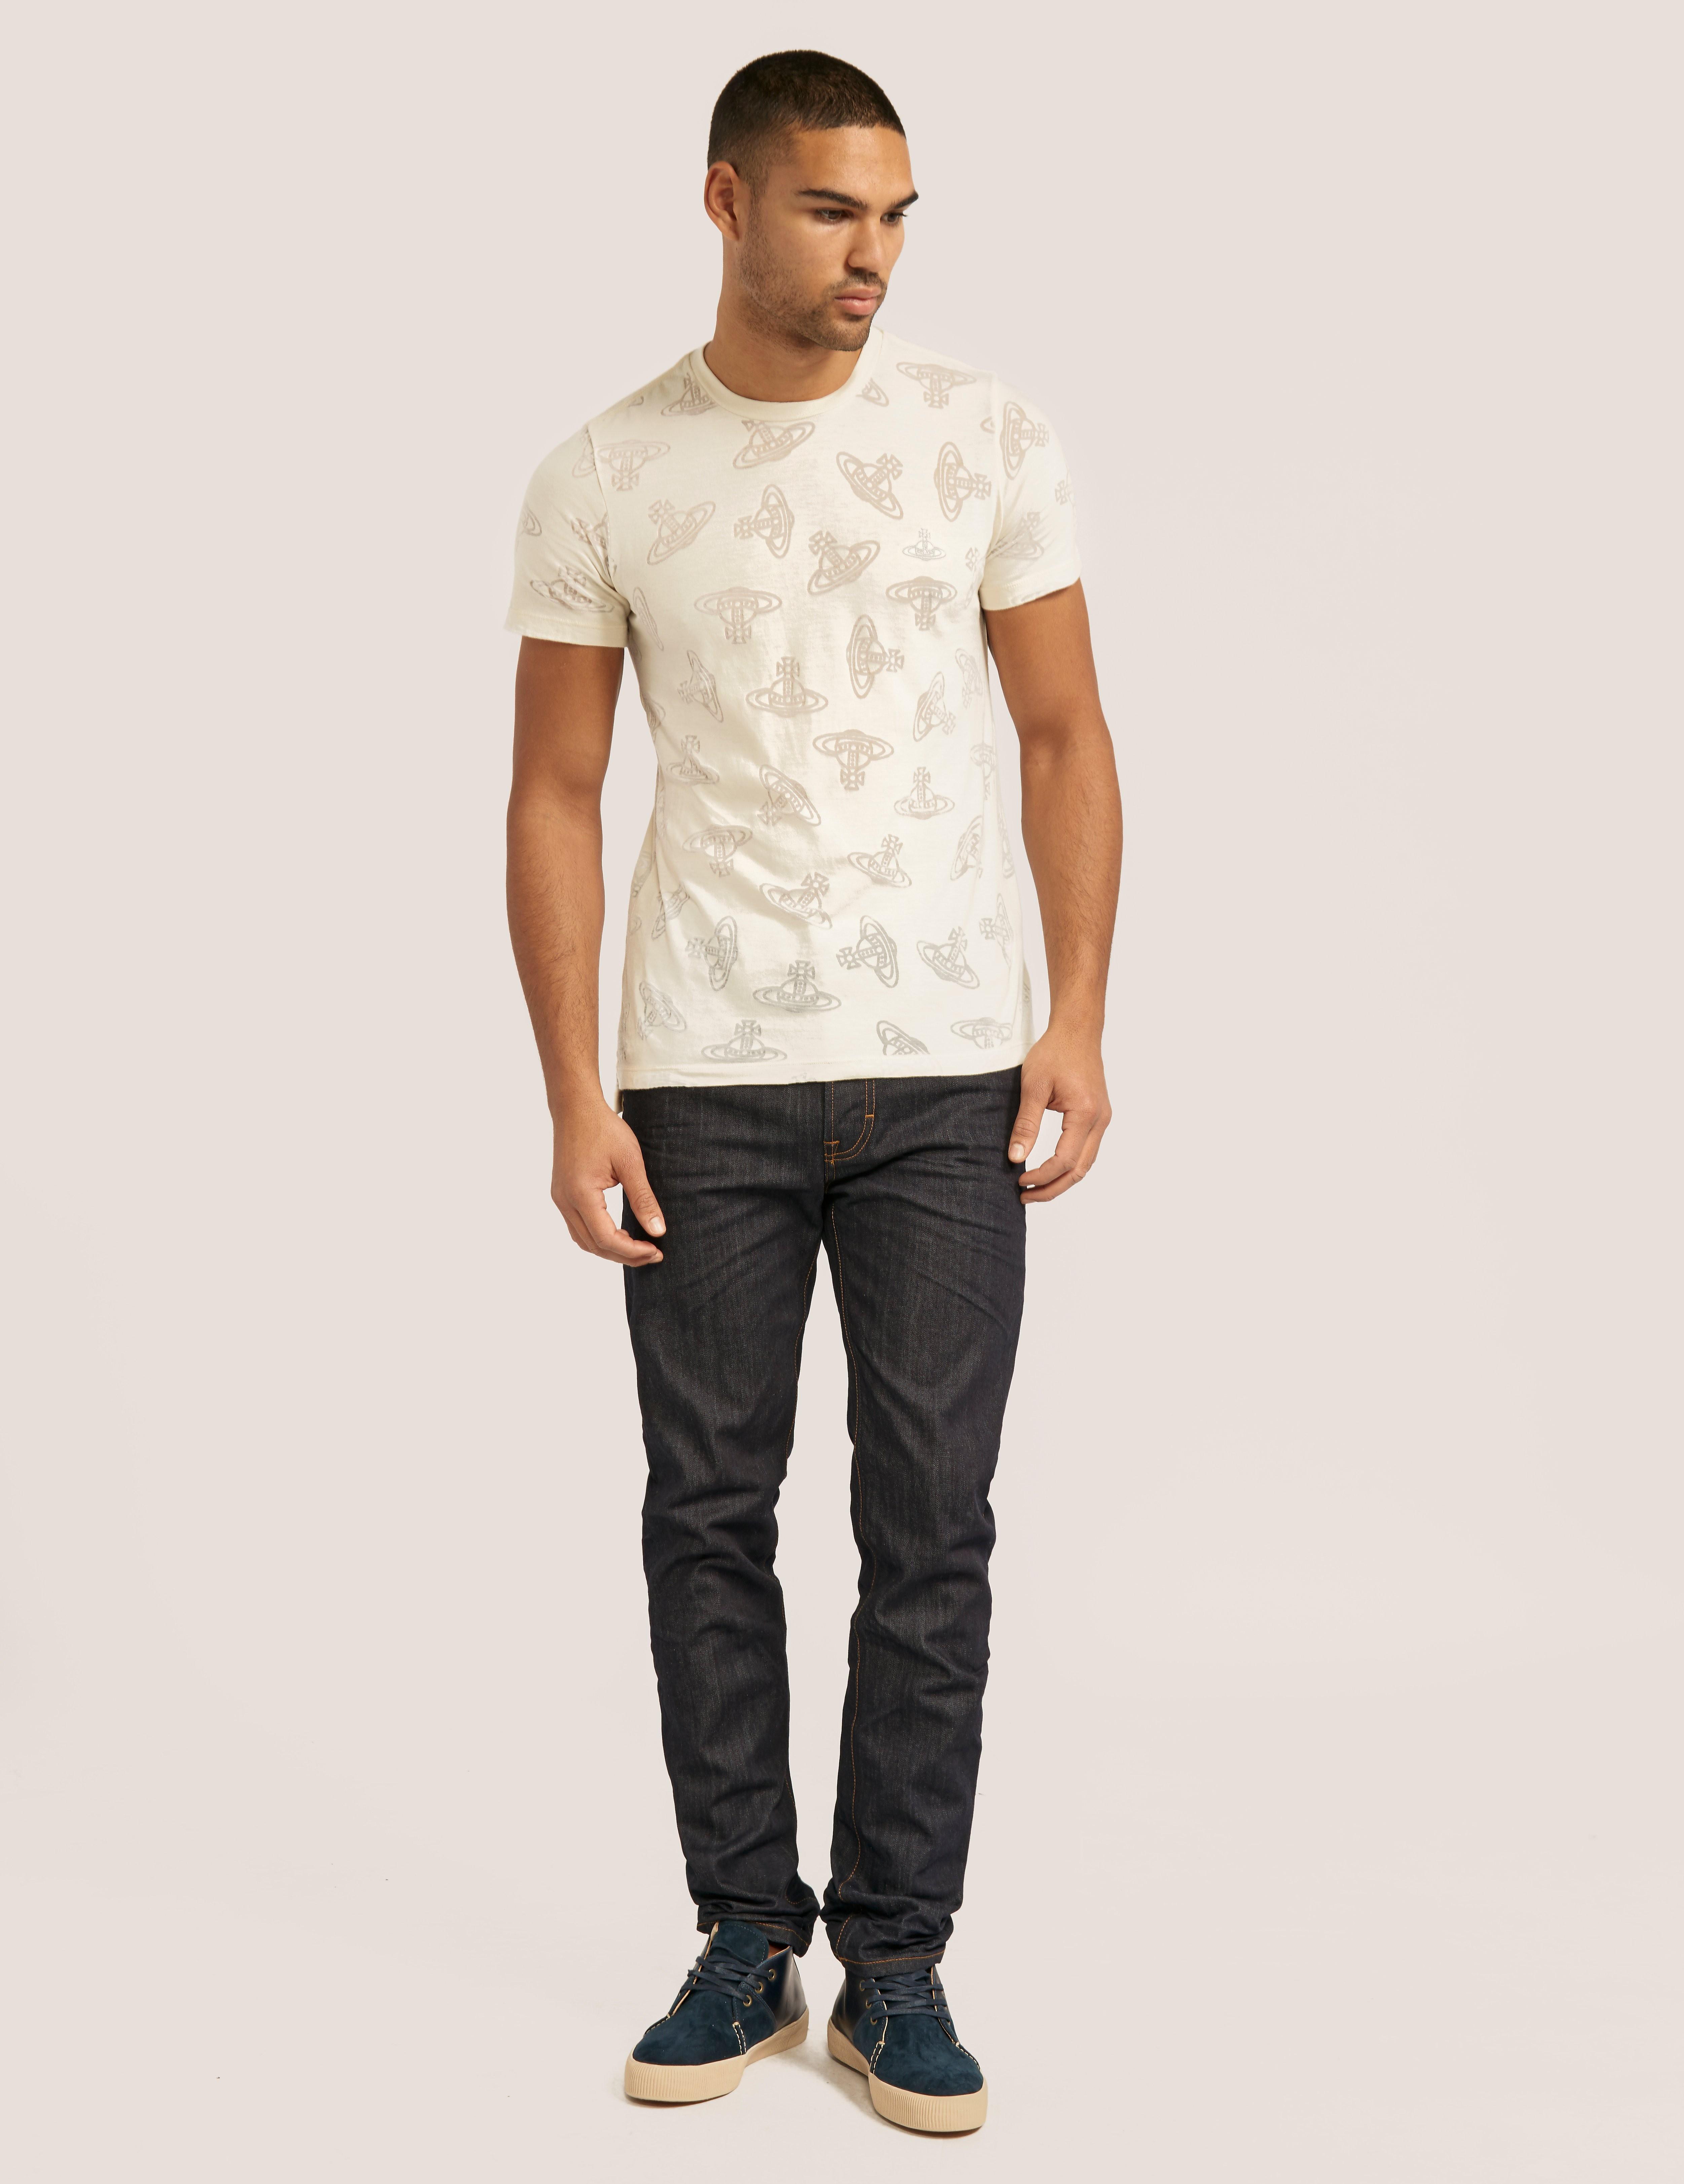 Vivienne Westwood Anglomania Orb Slim Jeans